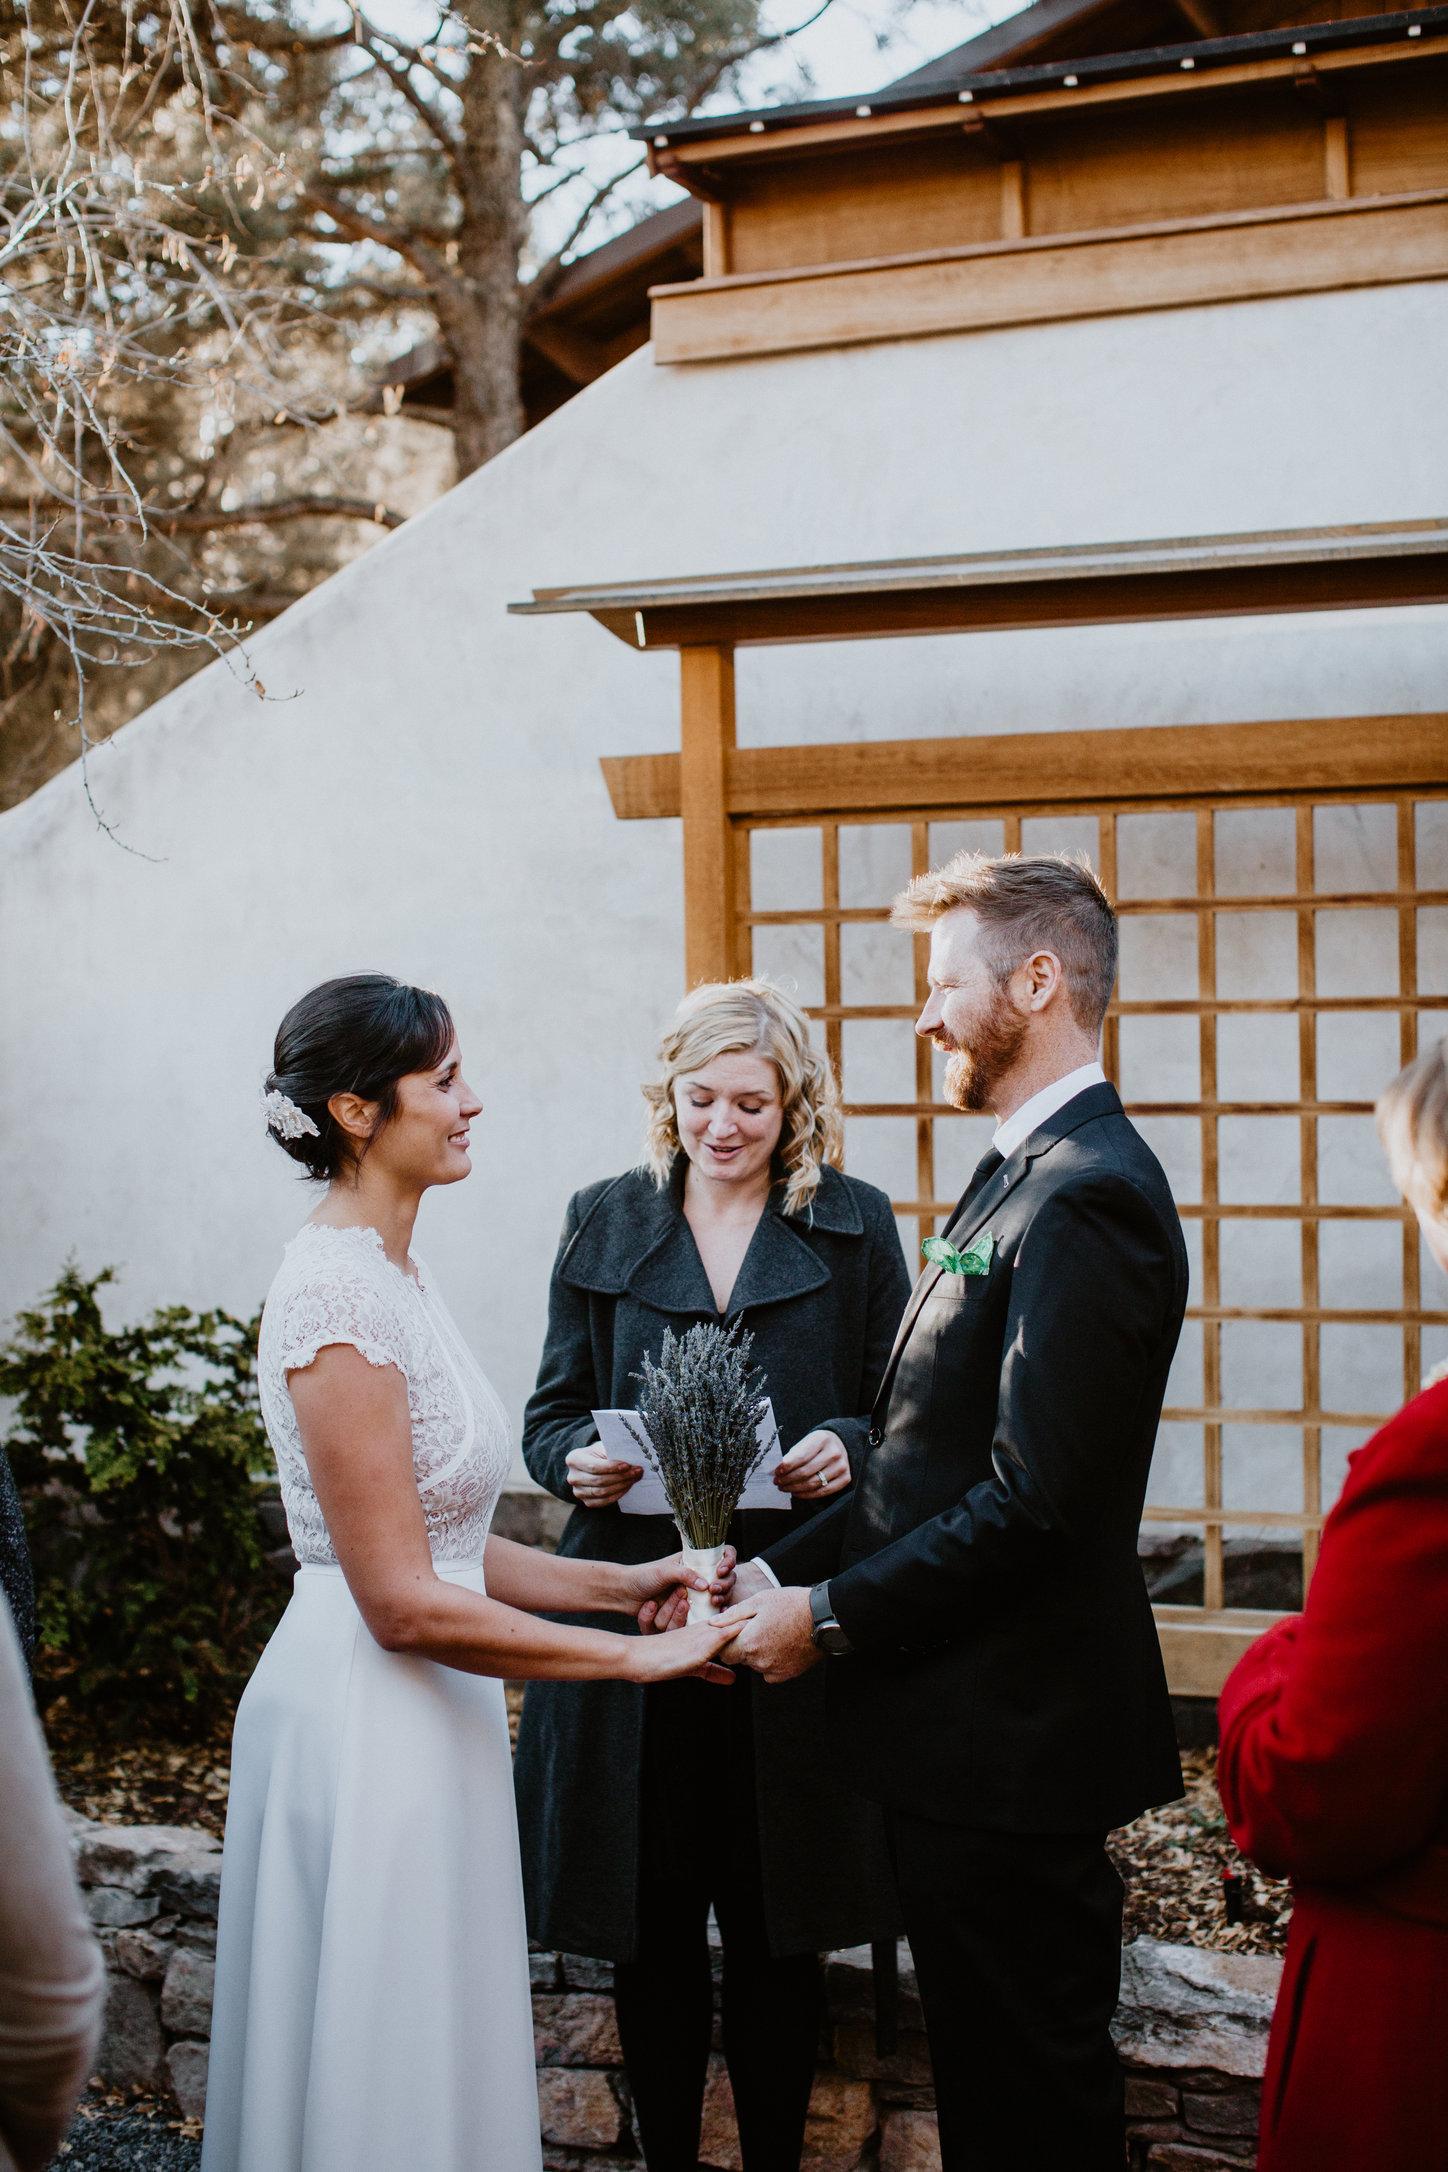 HandM-wedding-59.jpg